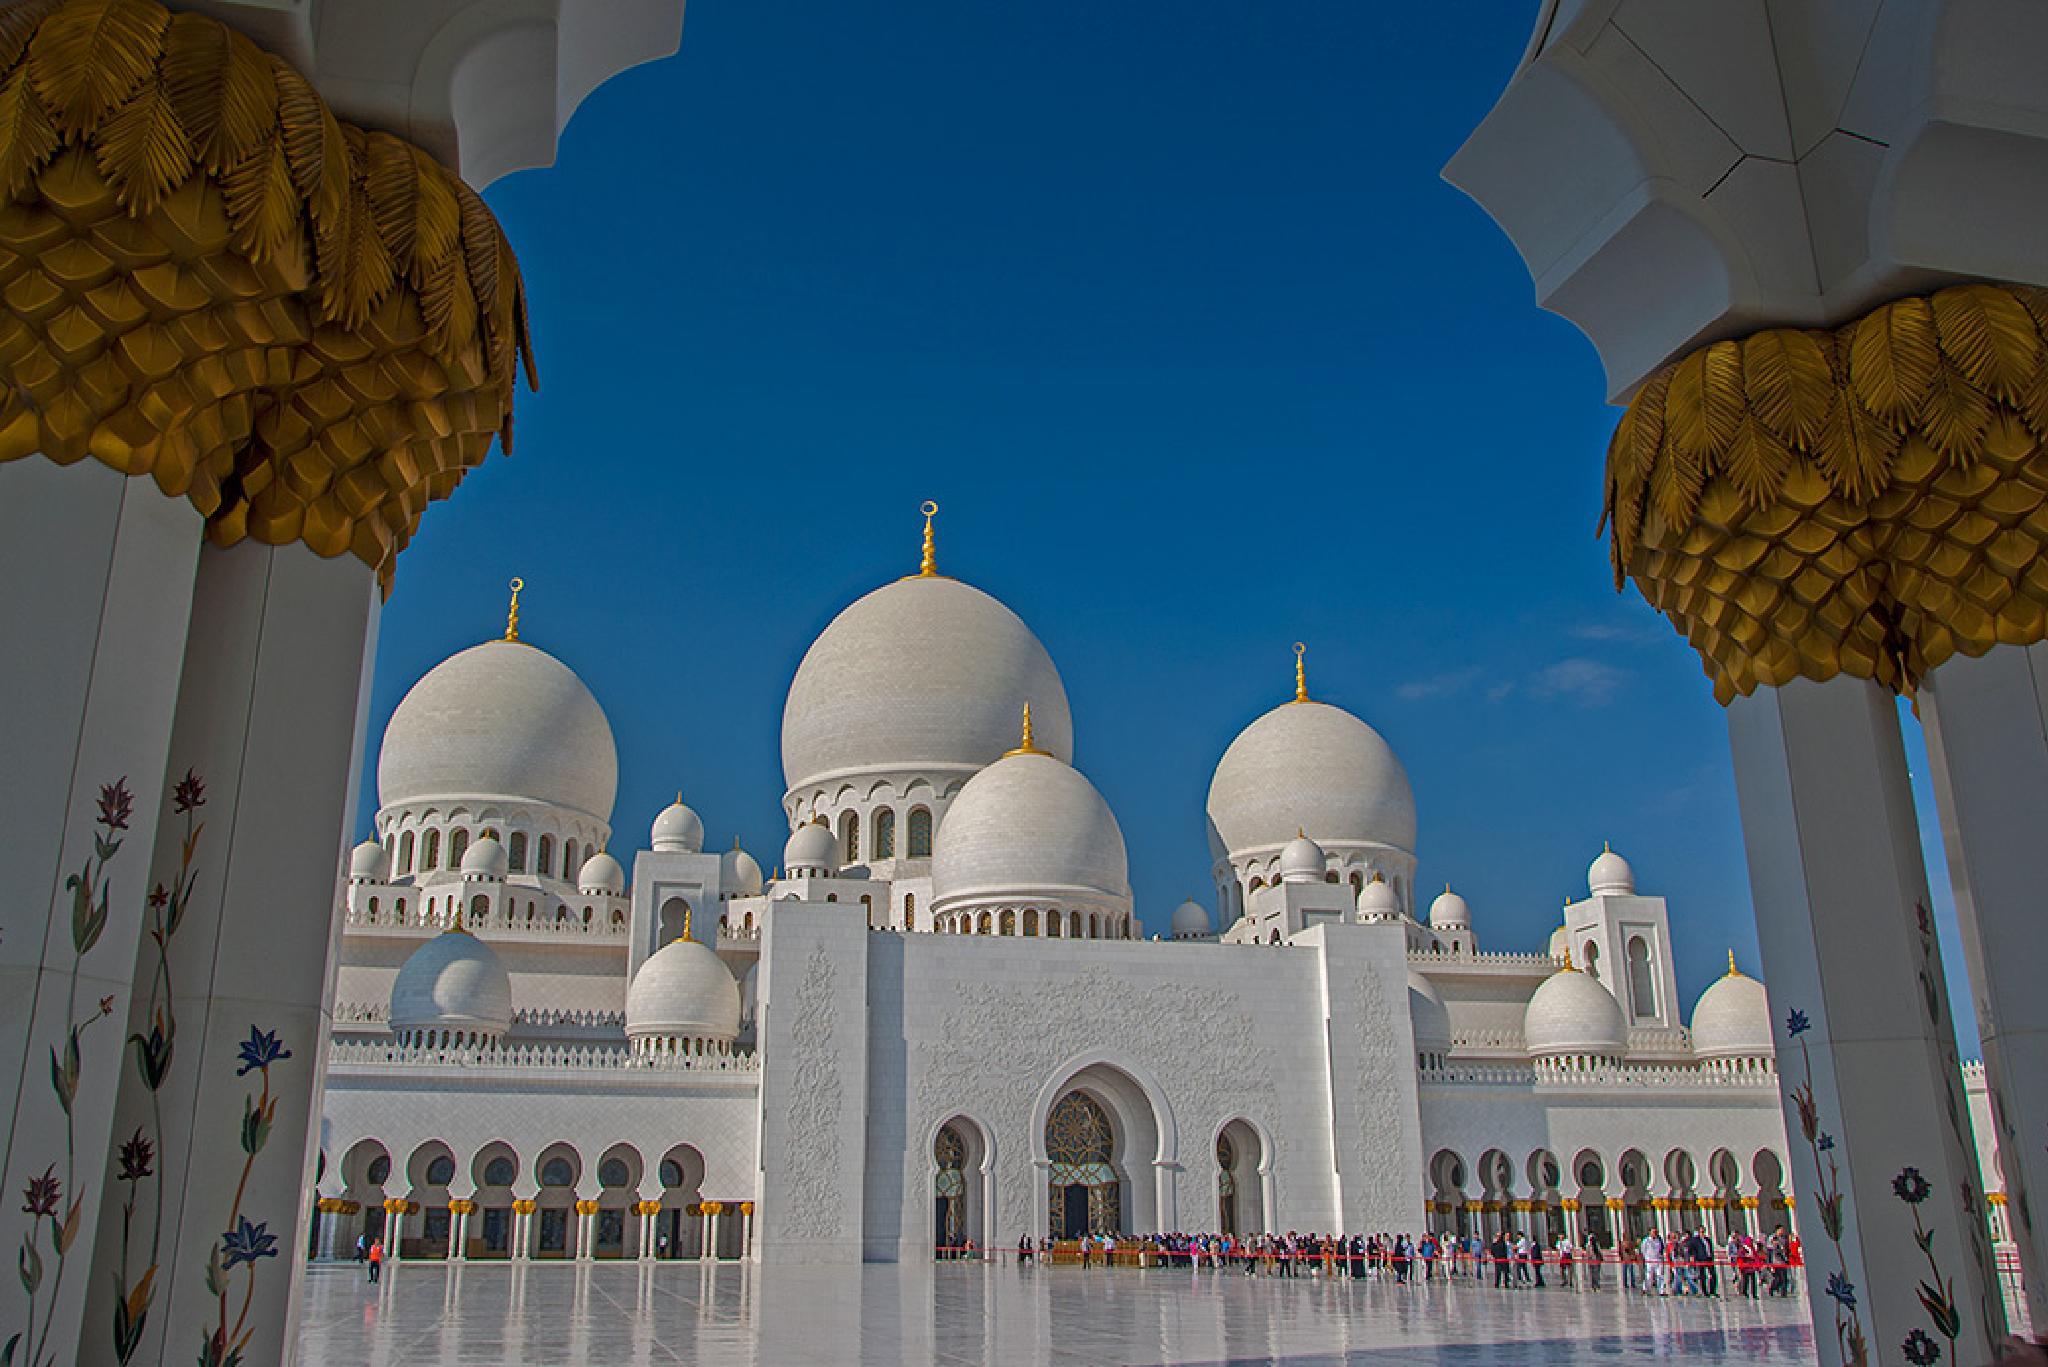 Sheikh Zayed Grand Mosque by Sotiris Siomis